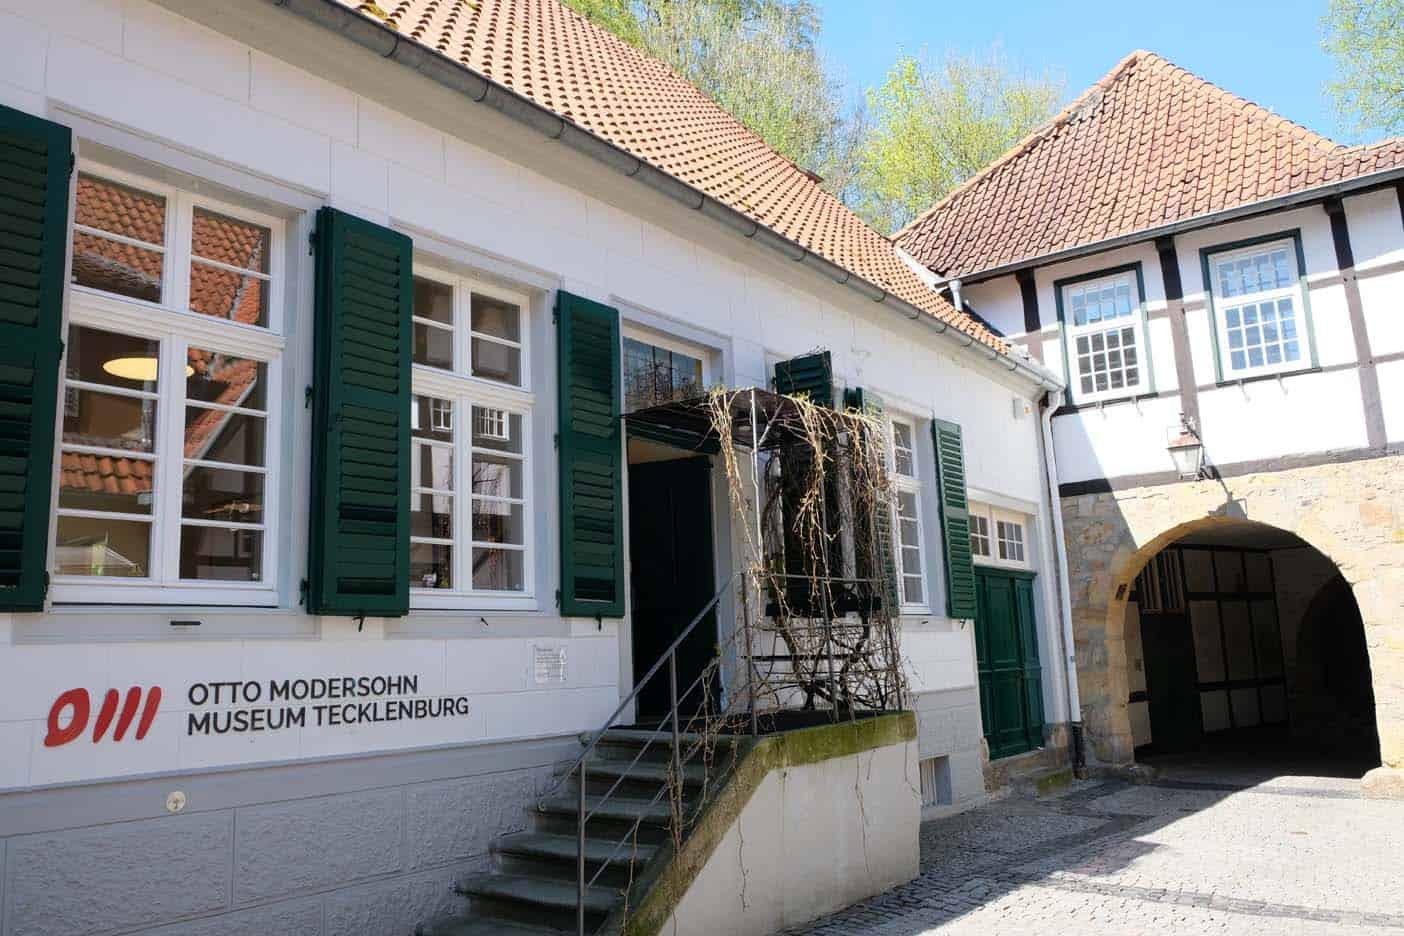 Otto Modersohn museum Tecklenburg